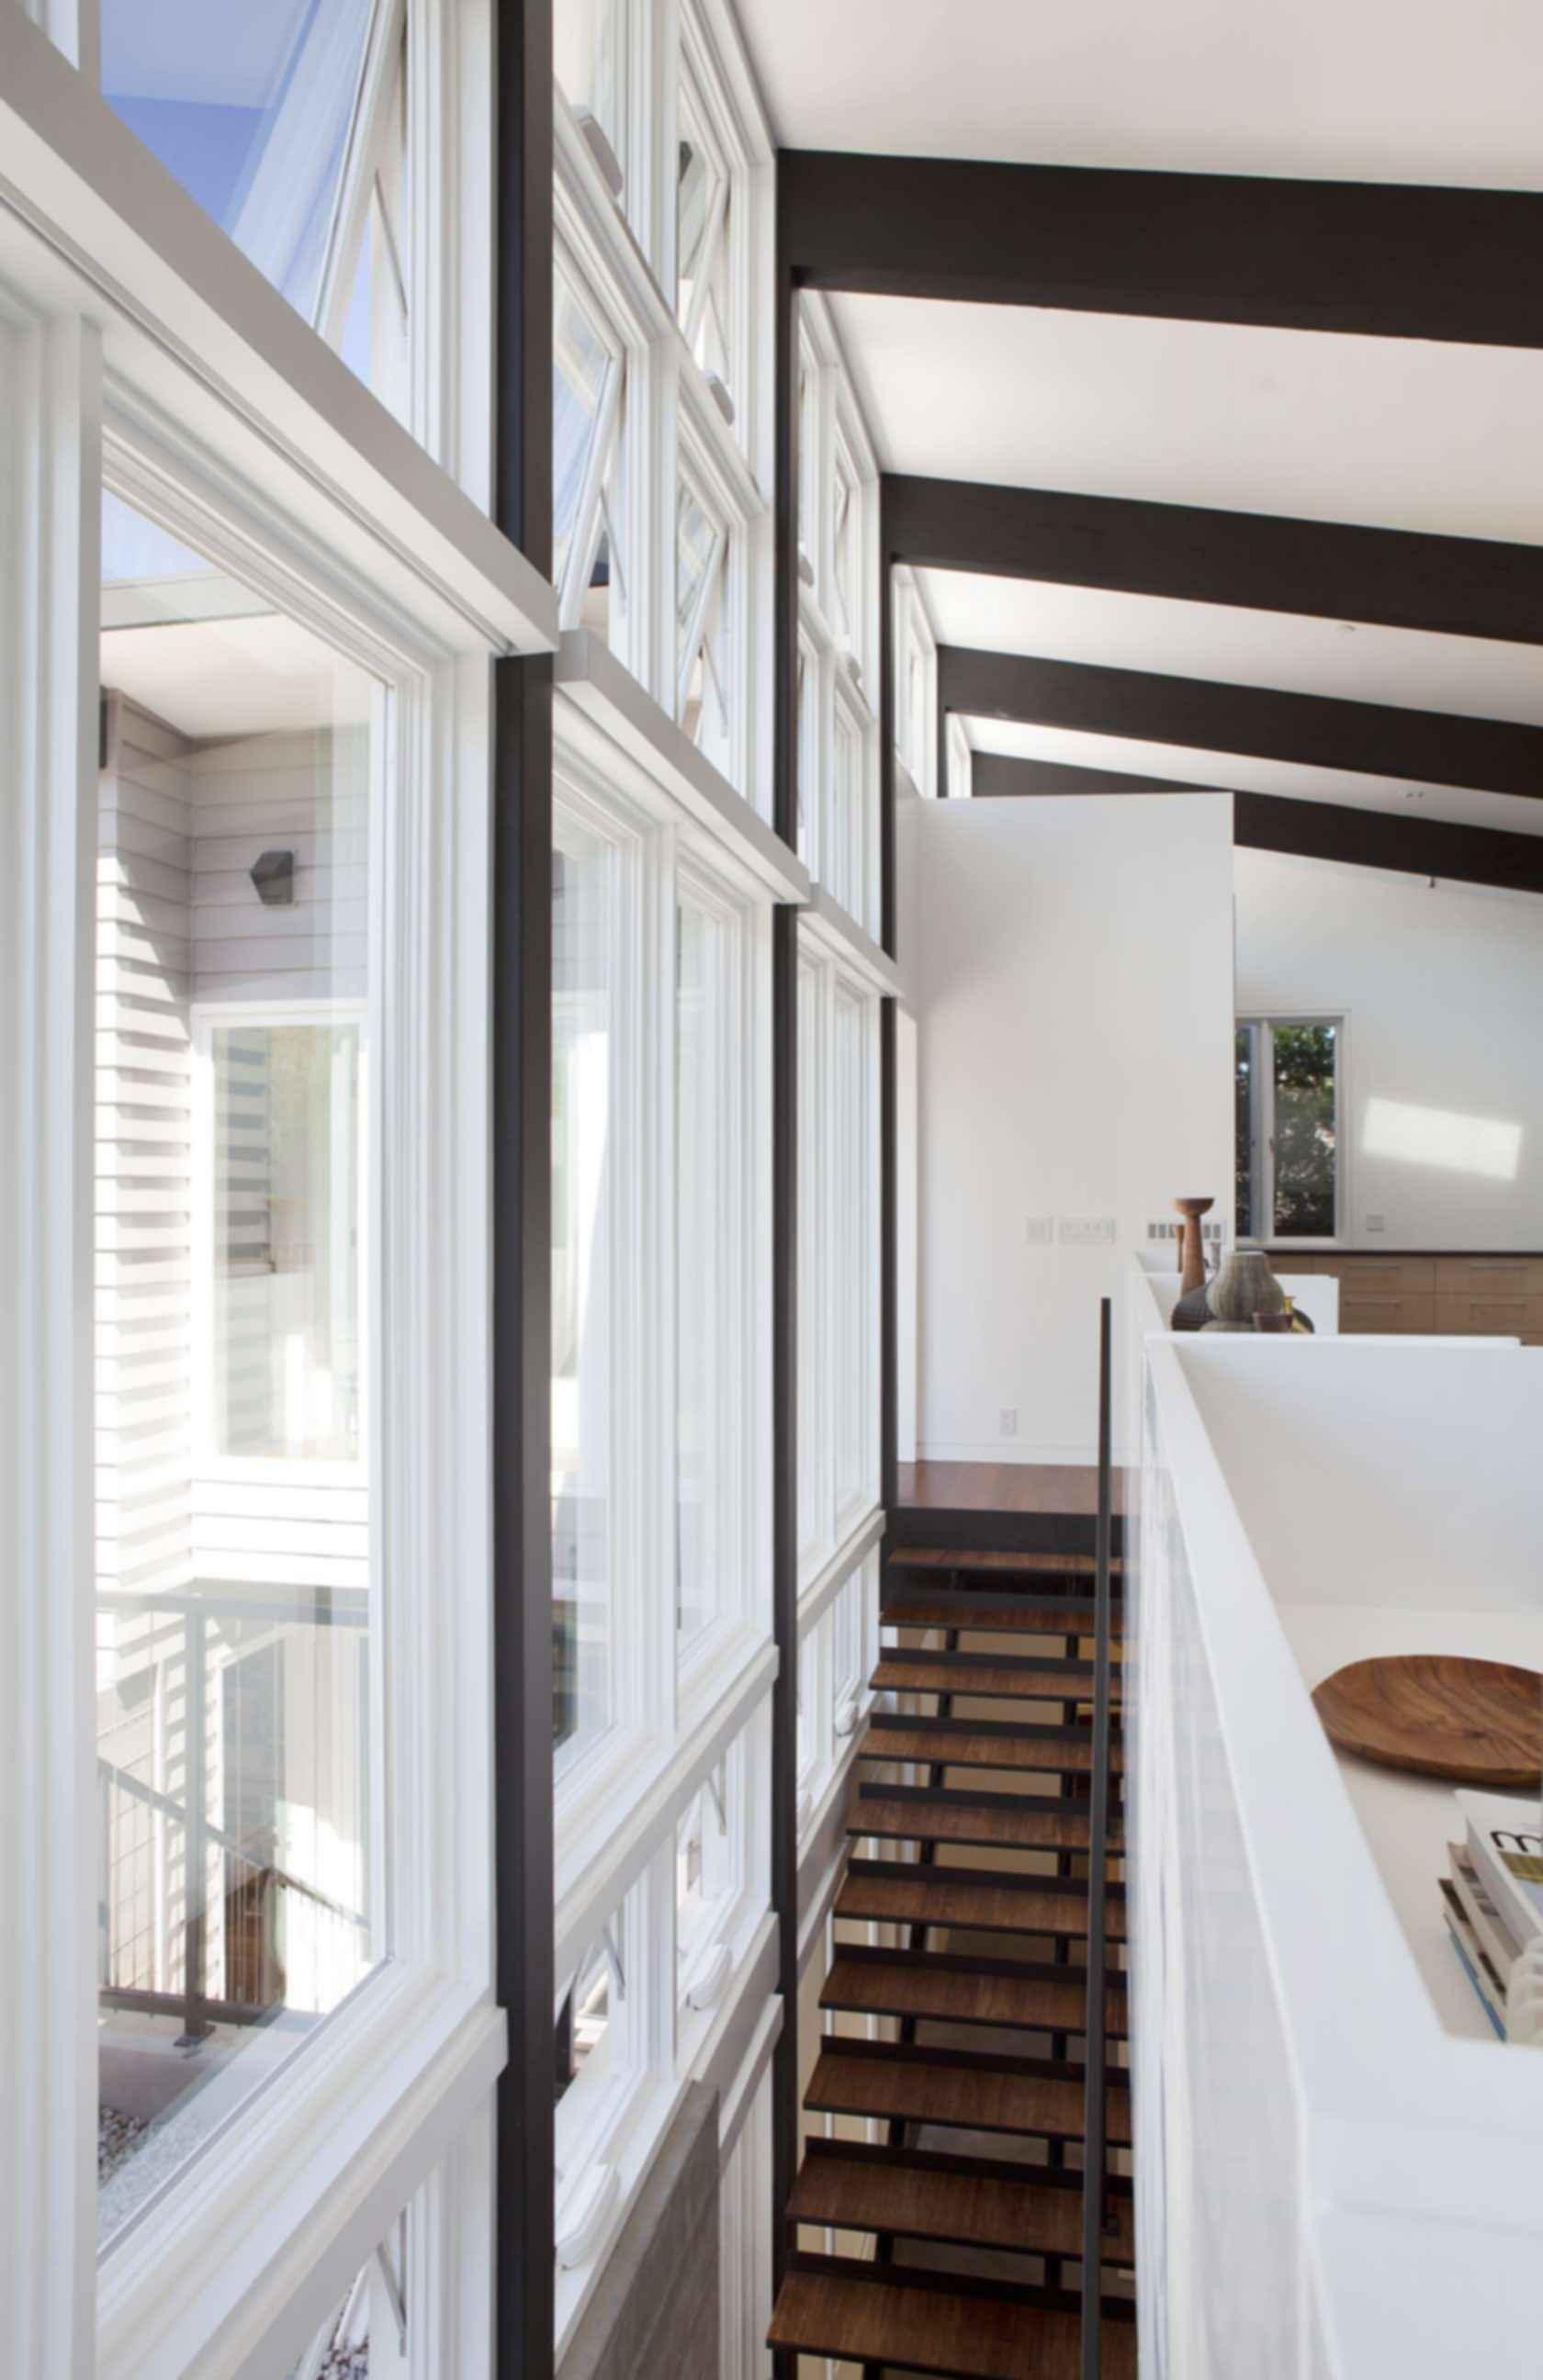 Net Zero Energy House - Interior/Stairs